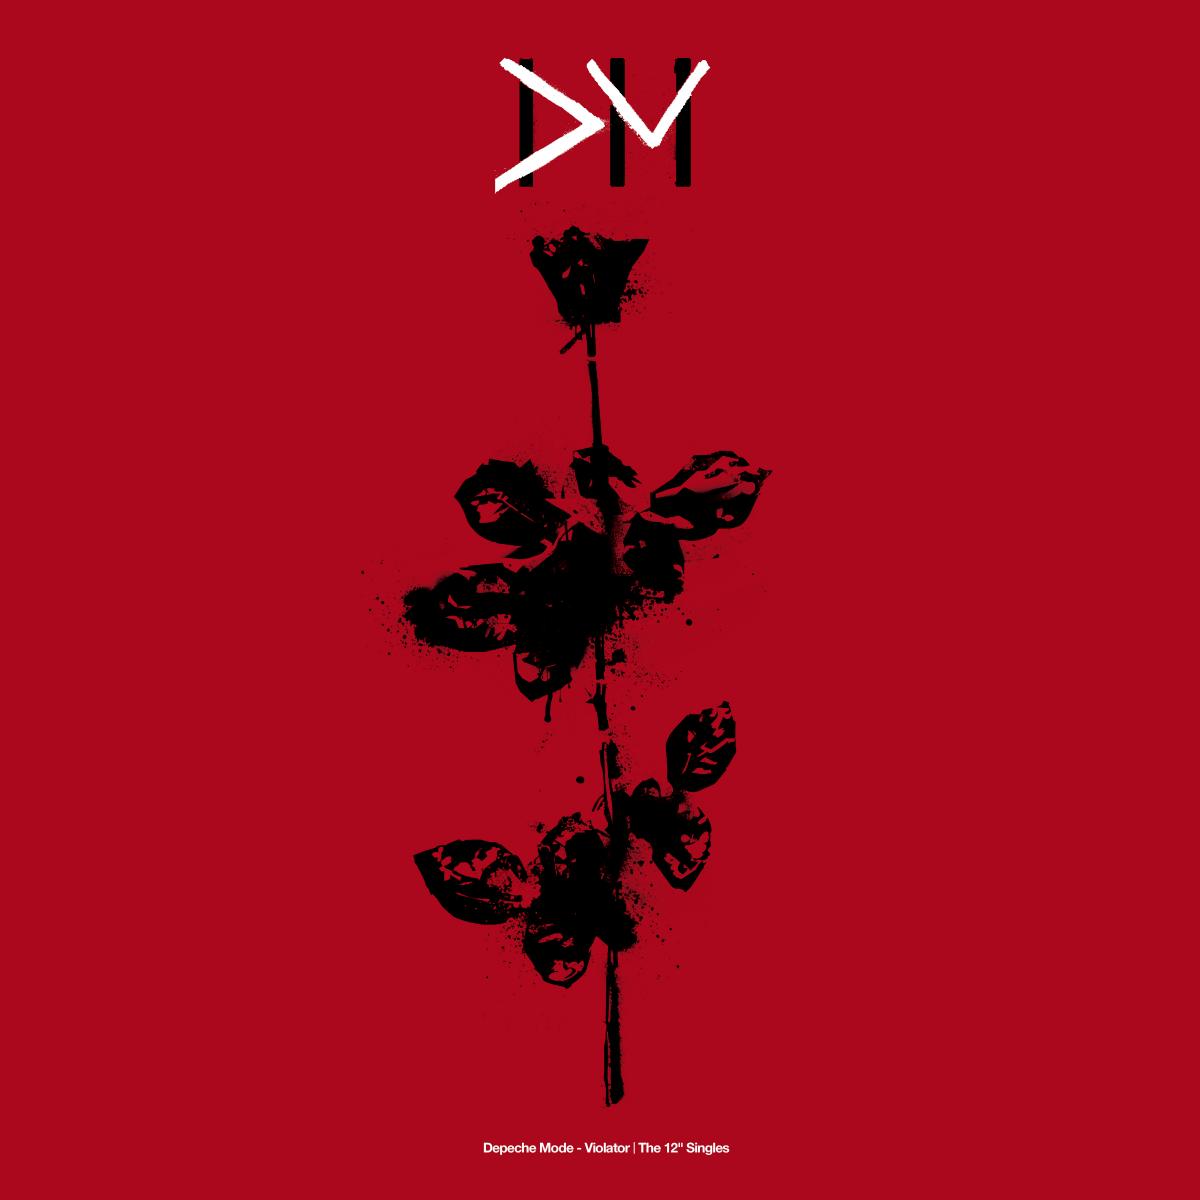 "Depeche Mode - Violator: The 12"" Singles -"